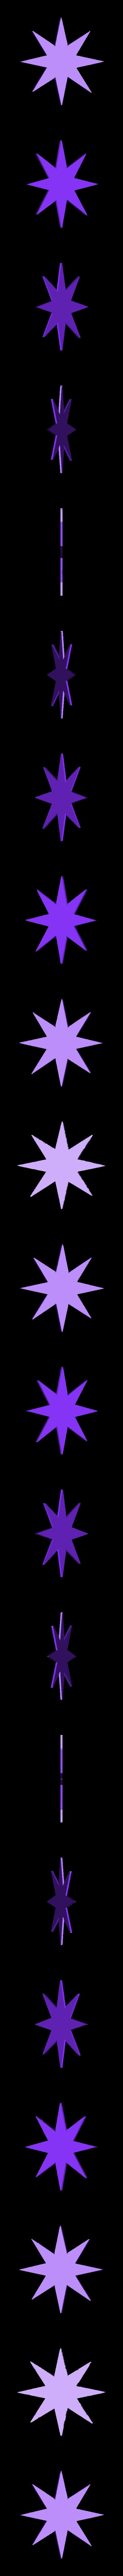 étoile8 4.stl Download STL file the christmas star • 3D printer model, catf3d